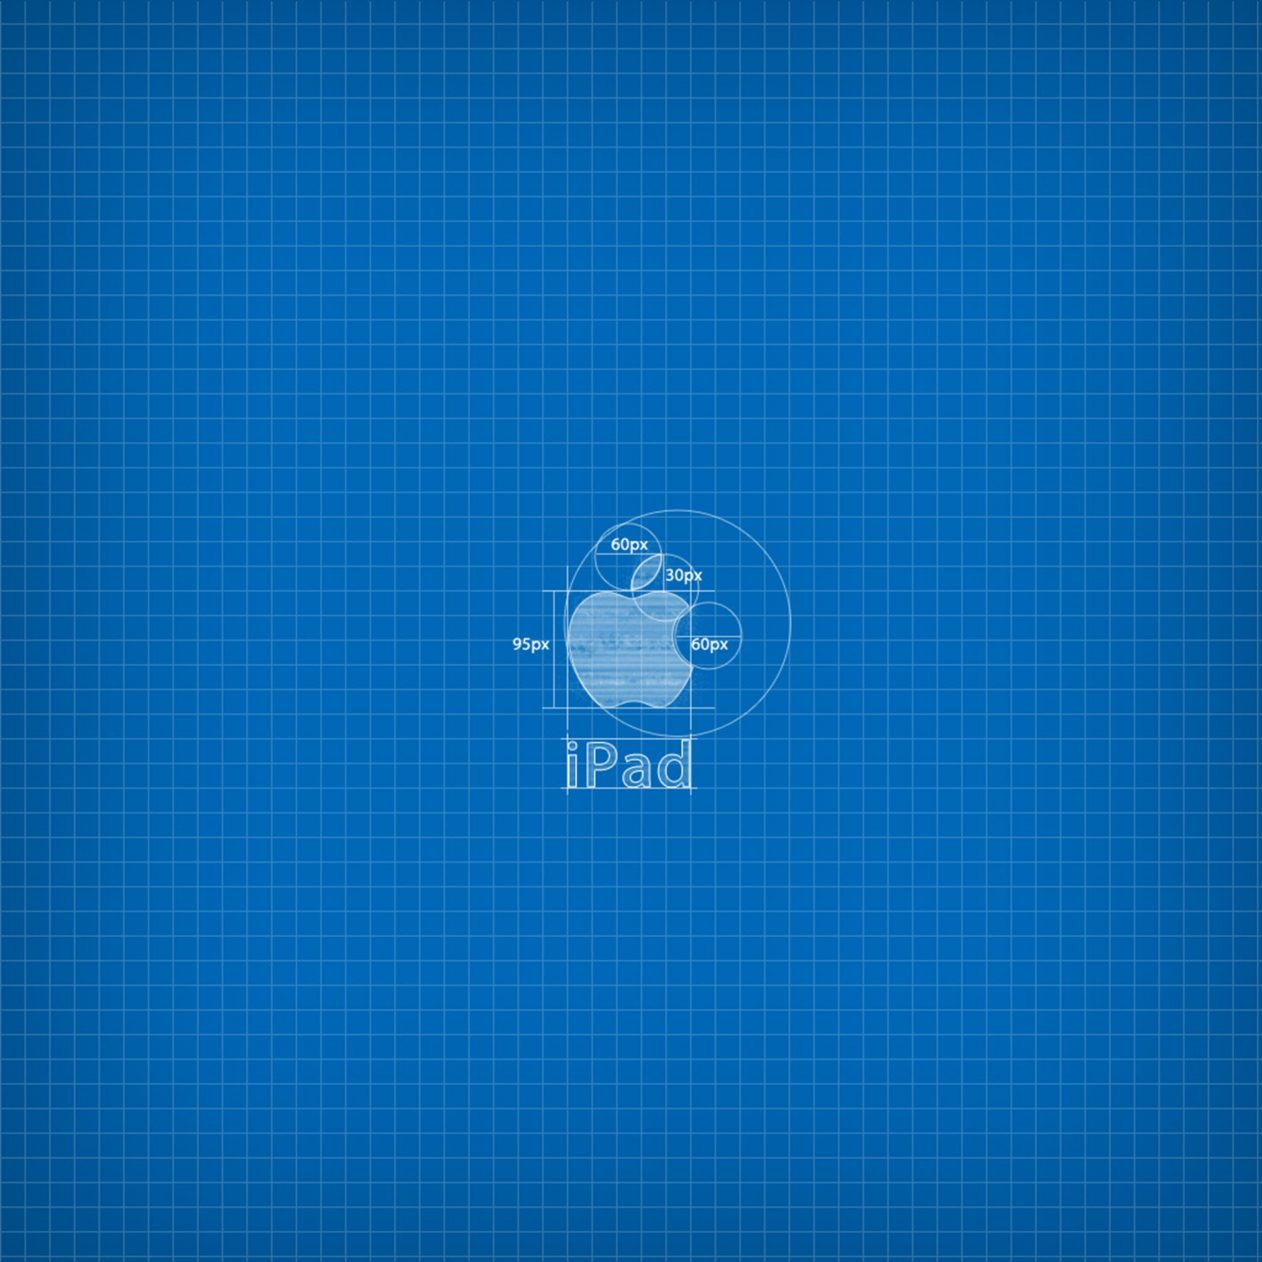 1262x1262 Parallax wallpaper 4k Apple Blueprint Ipad Wallpaper 1262x1262 pixels resolution